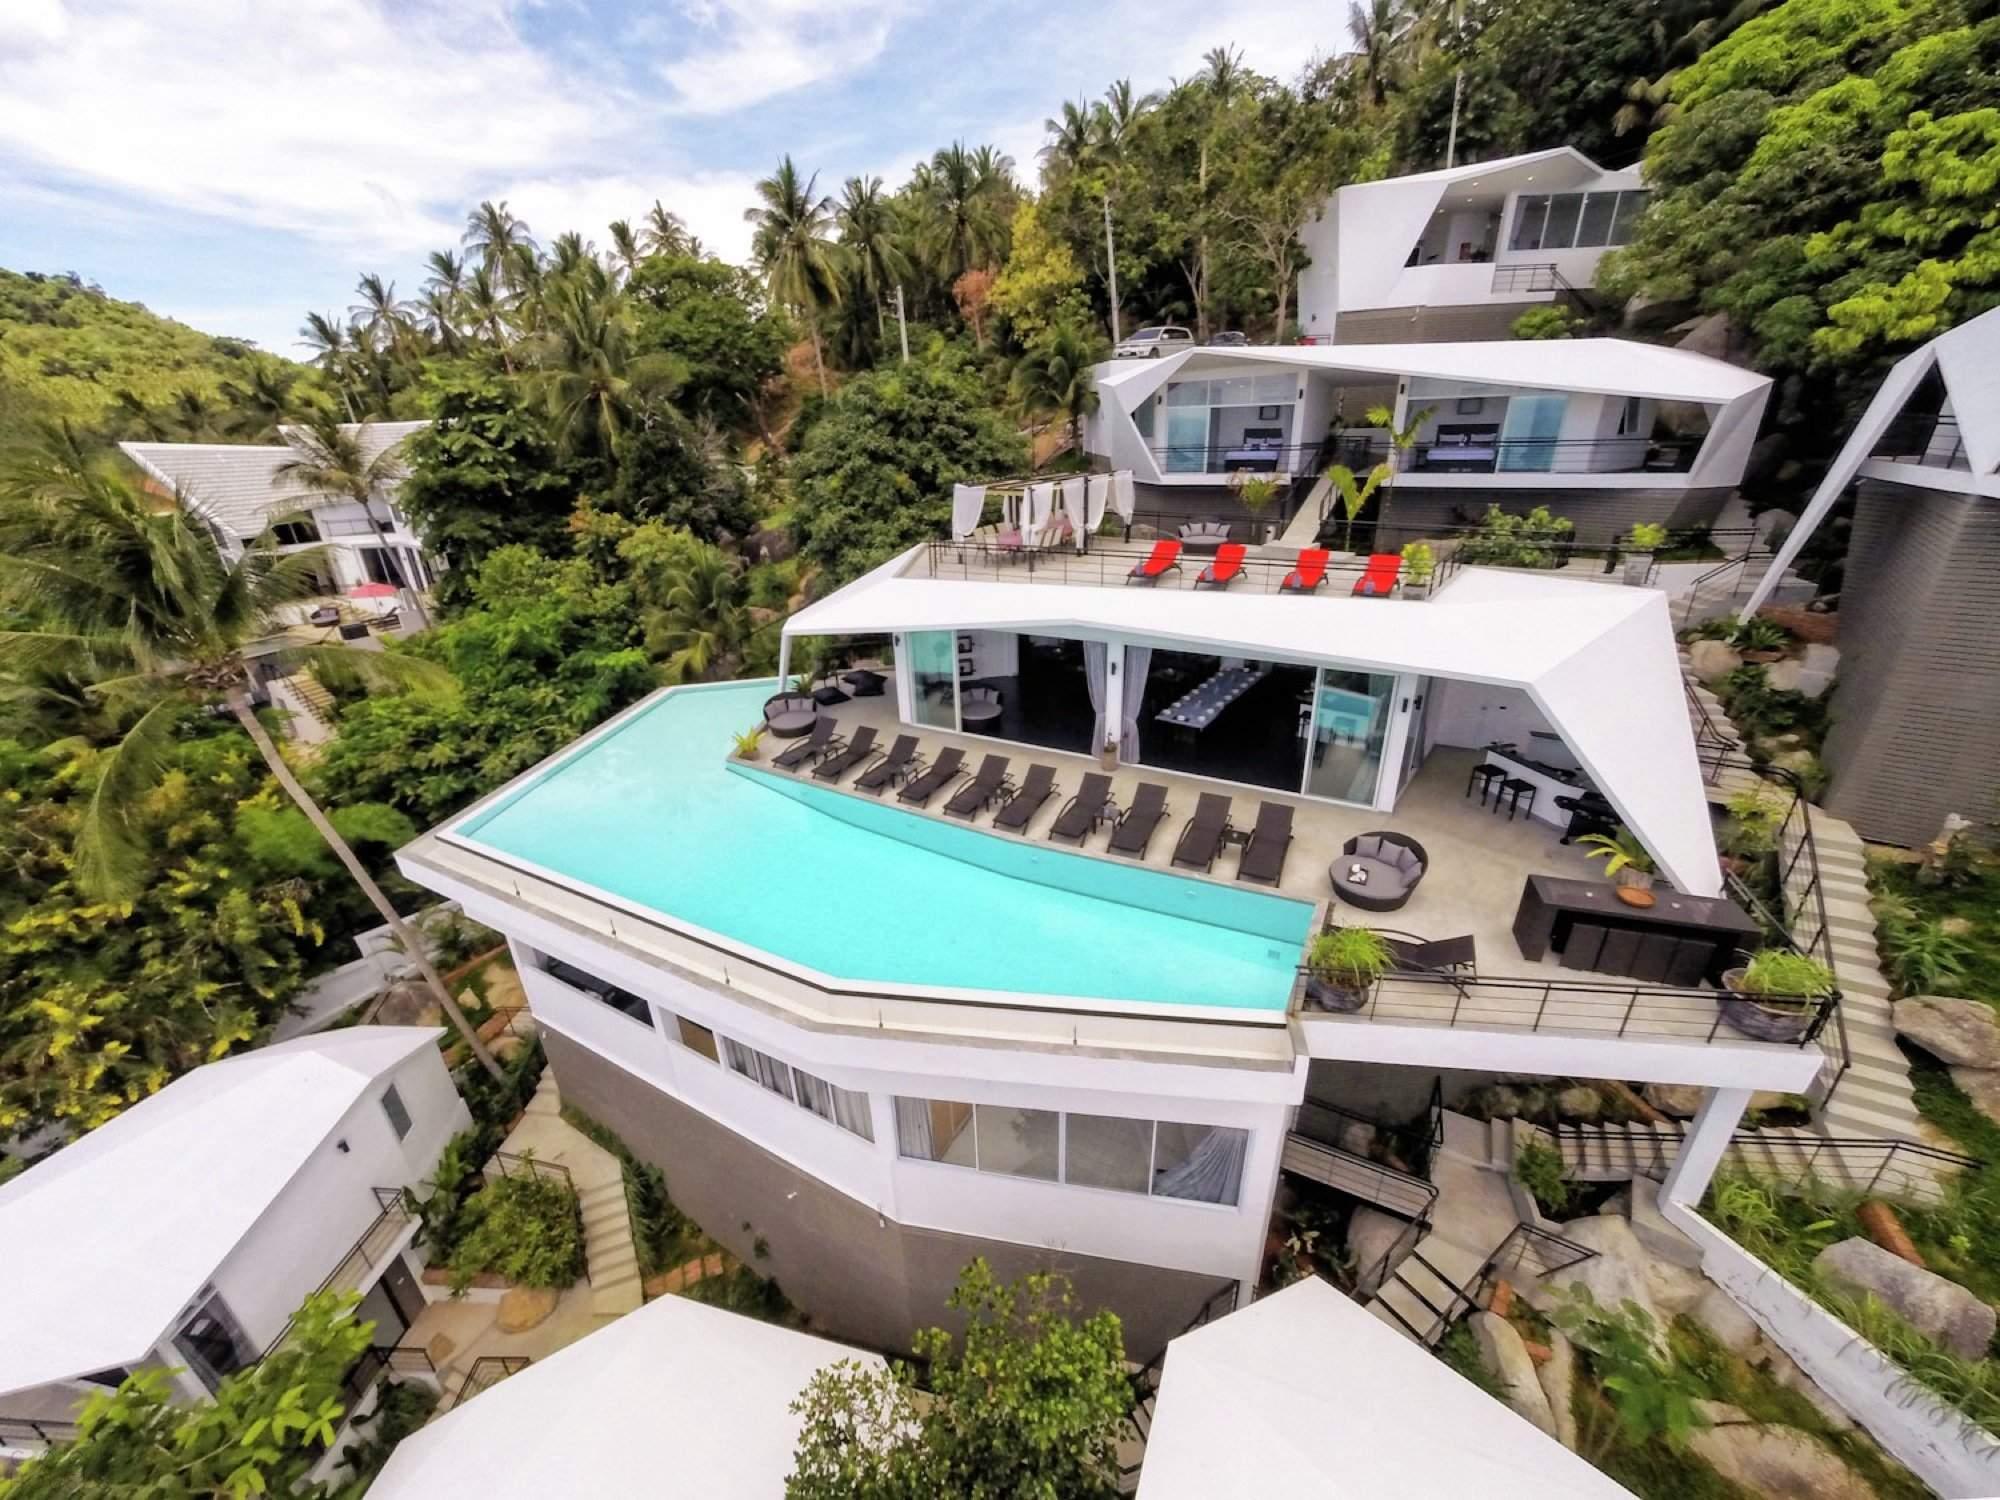 Вилла для аренды на острове Самуи в Таиланде